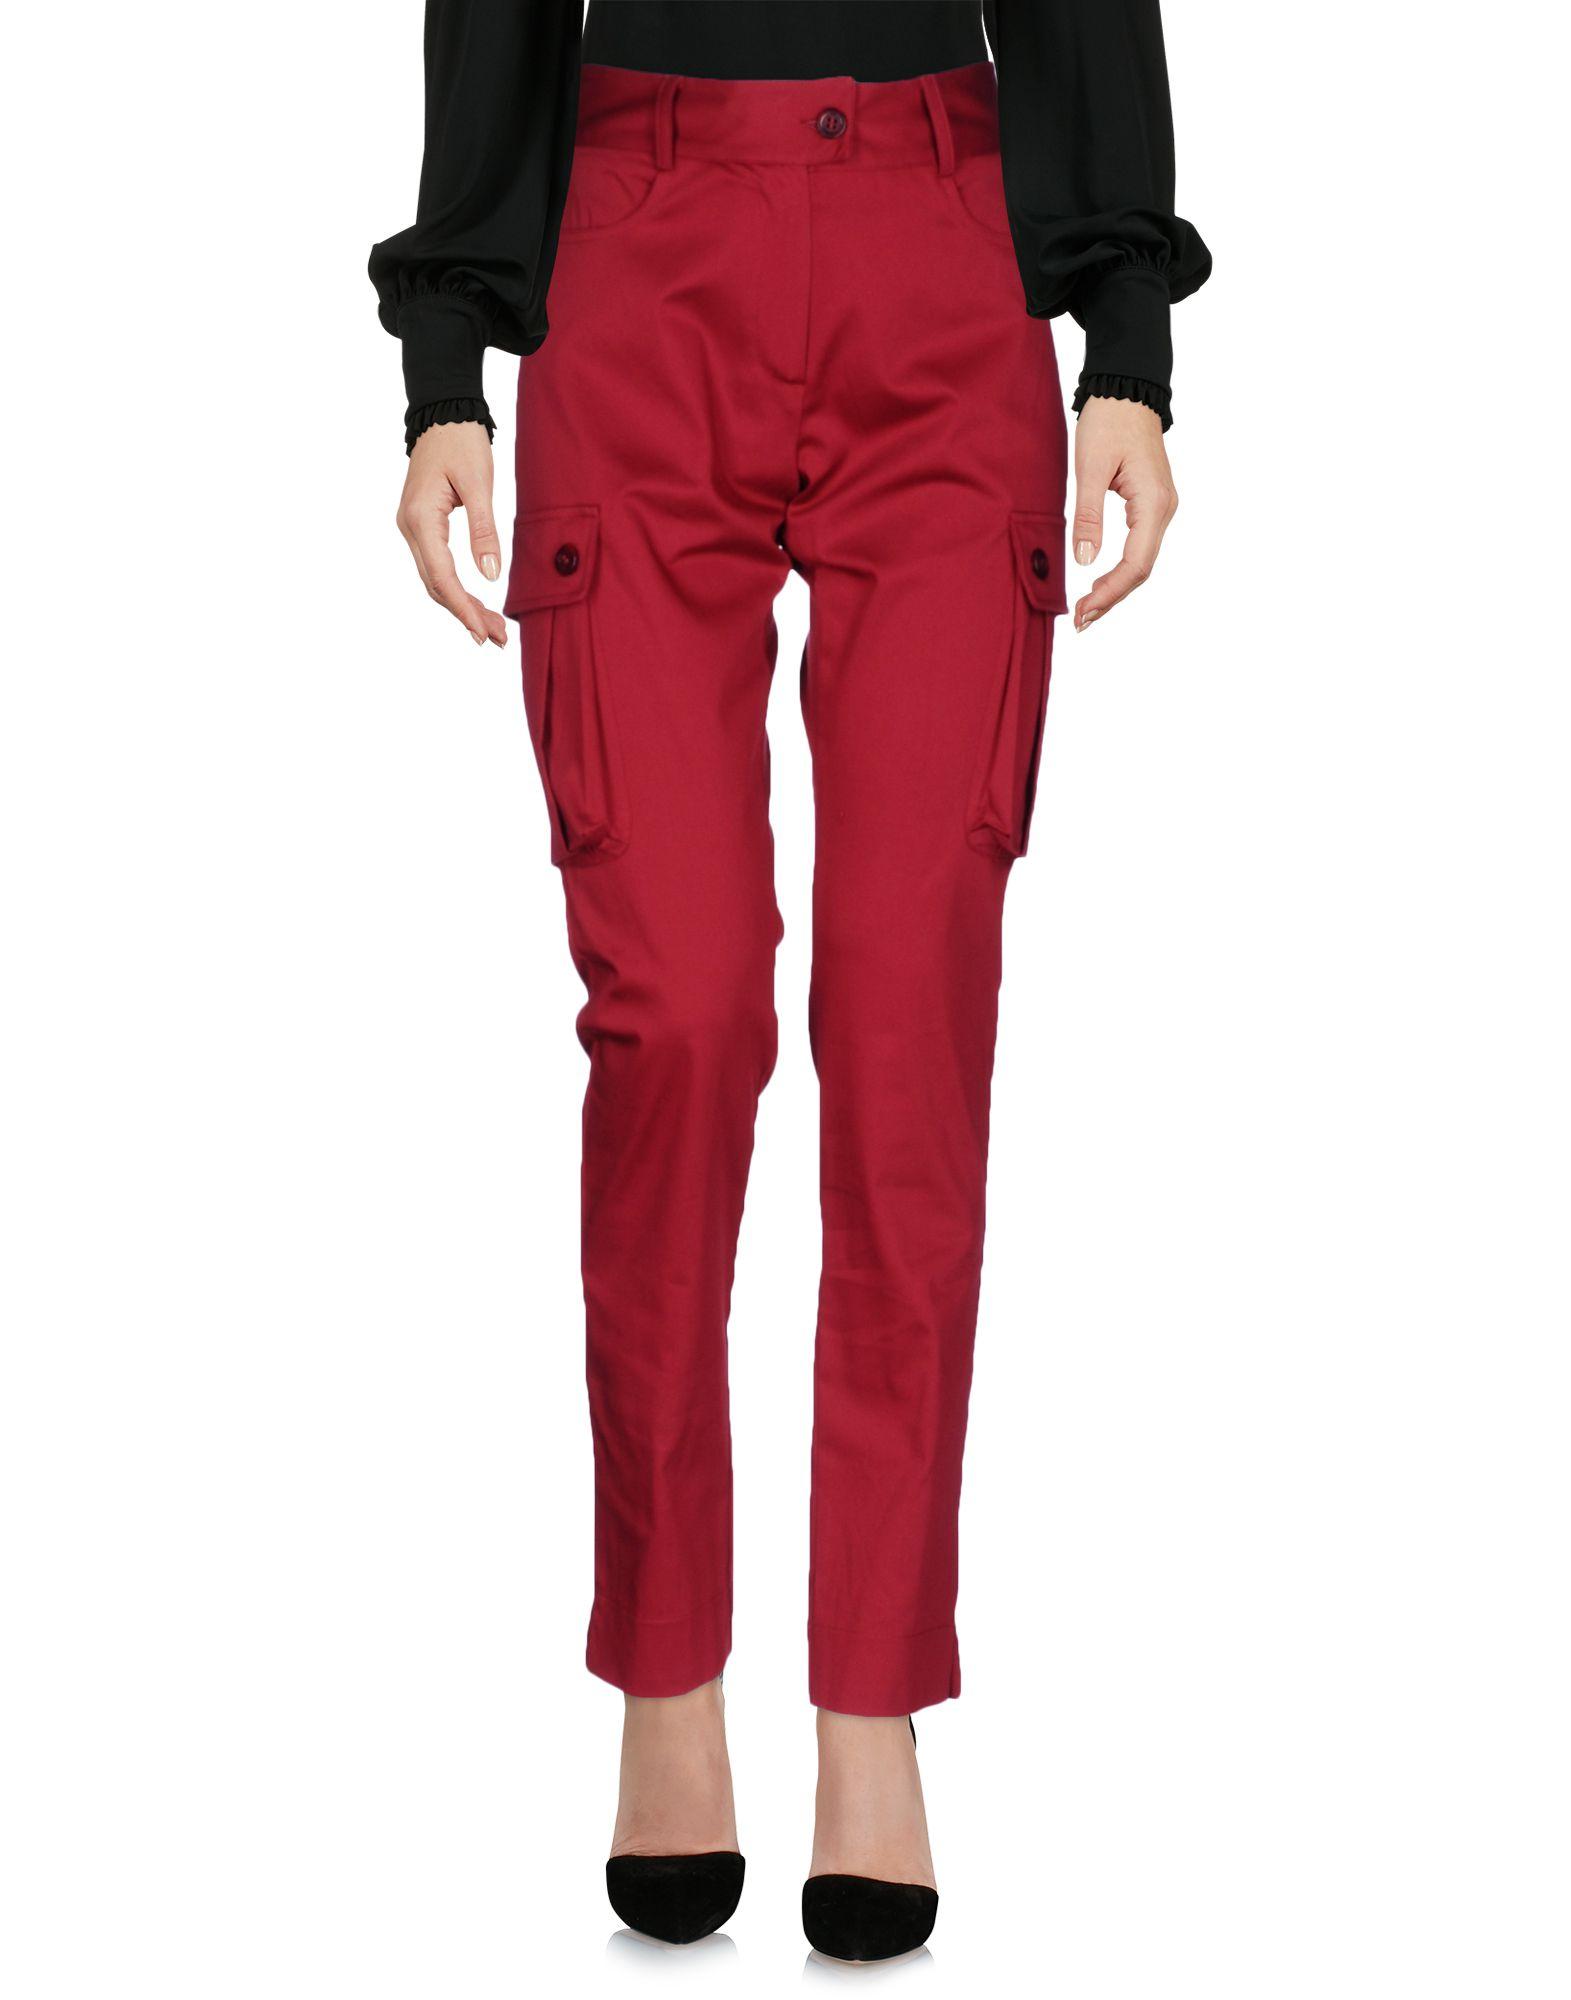 MEAM BY RICARDO PRETO Повседневные брюки оправа для очков other red by ricardo 30g 139